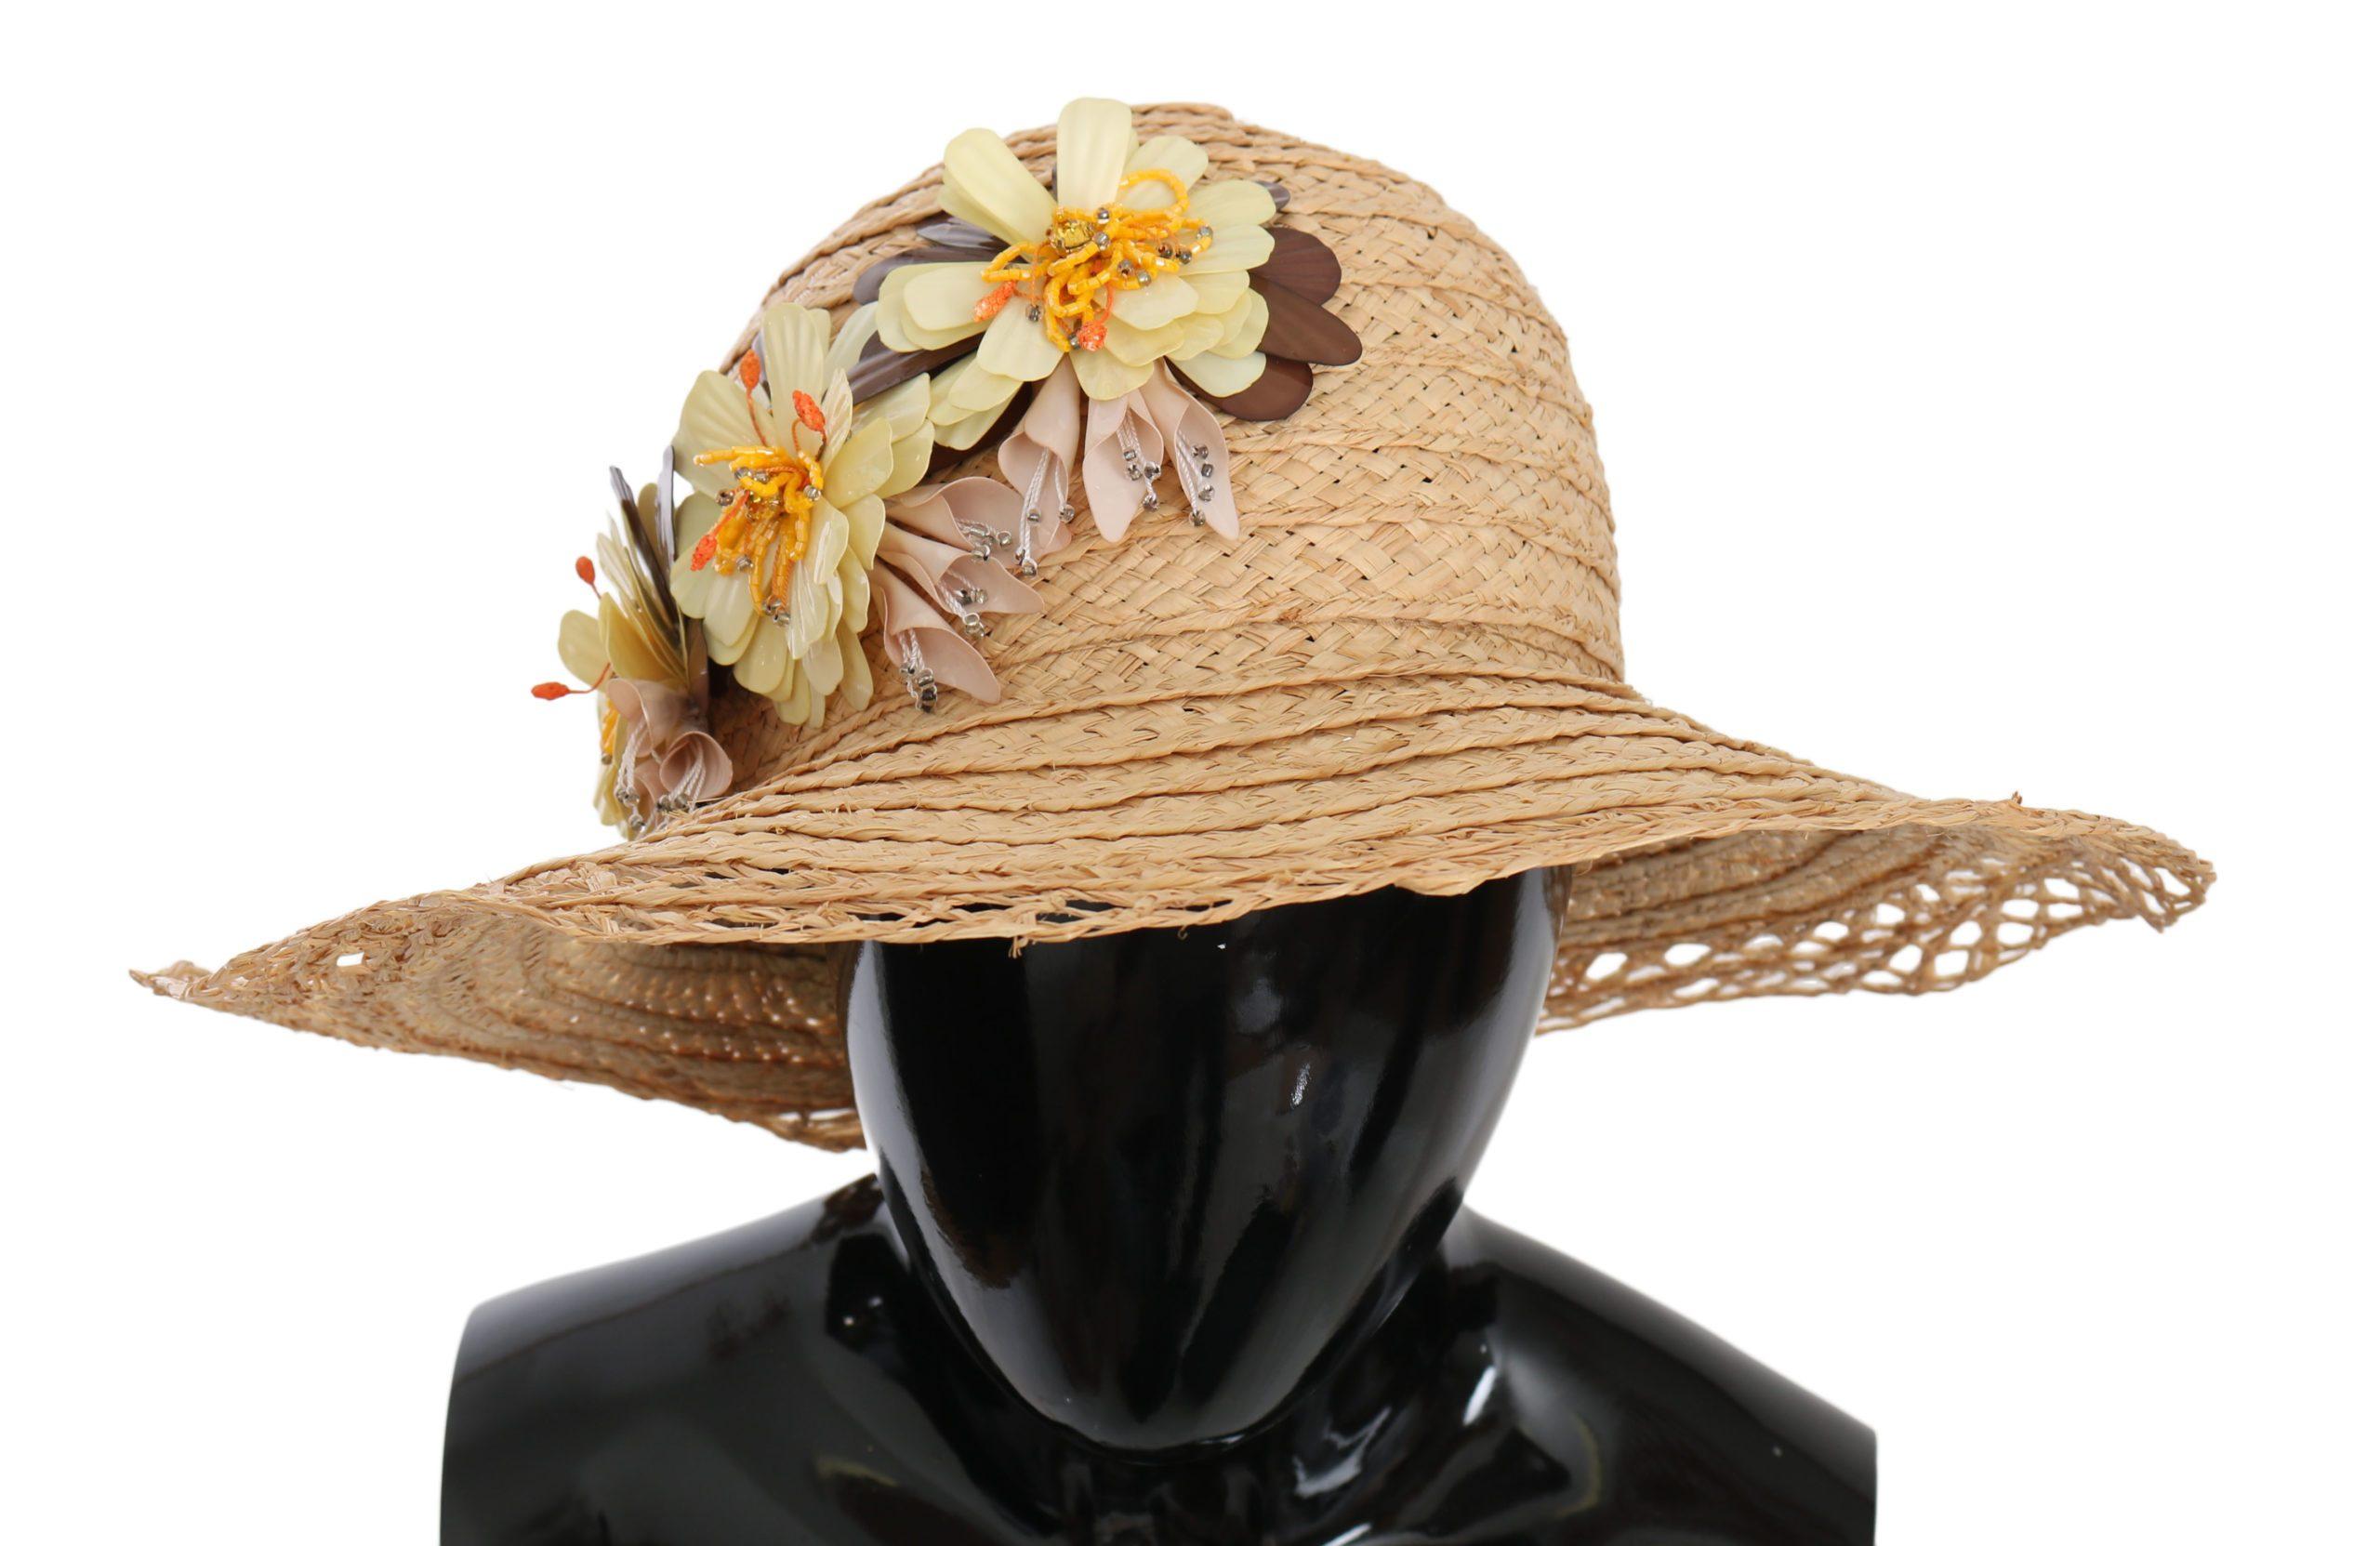 Dolce & Gabbana Women's Wide Brim Floral Capello Hat Beige HAT70225 - 56 cm XS